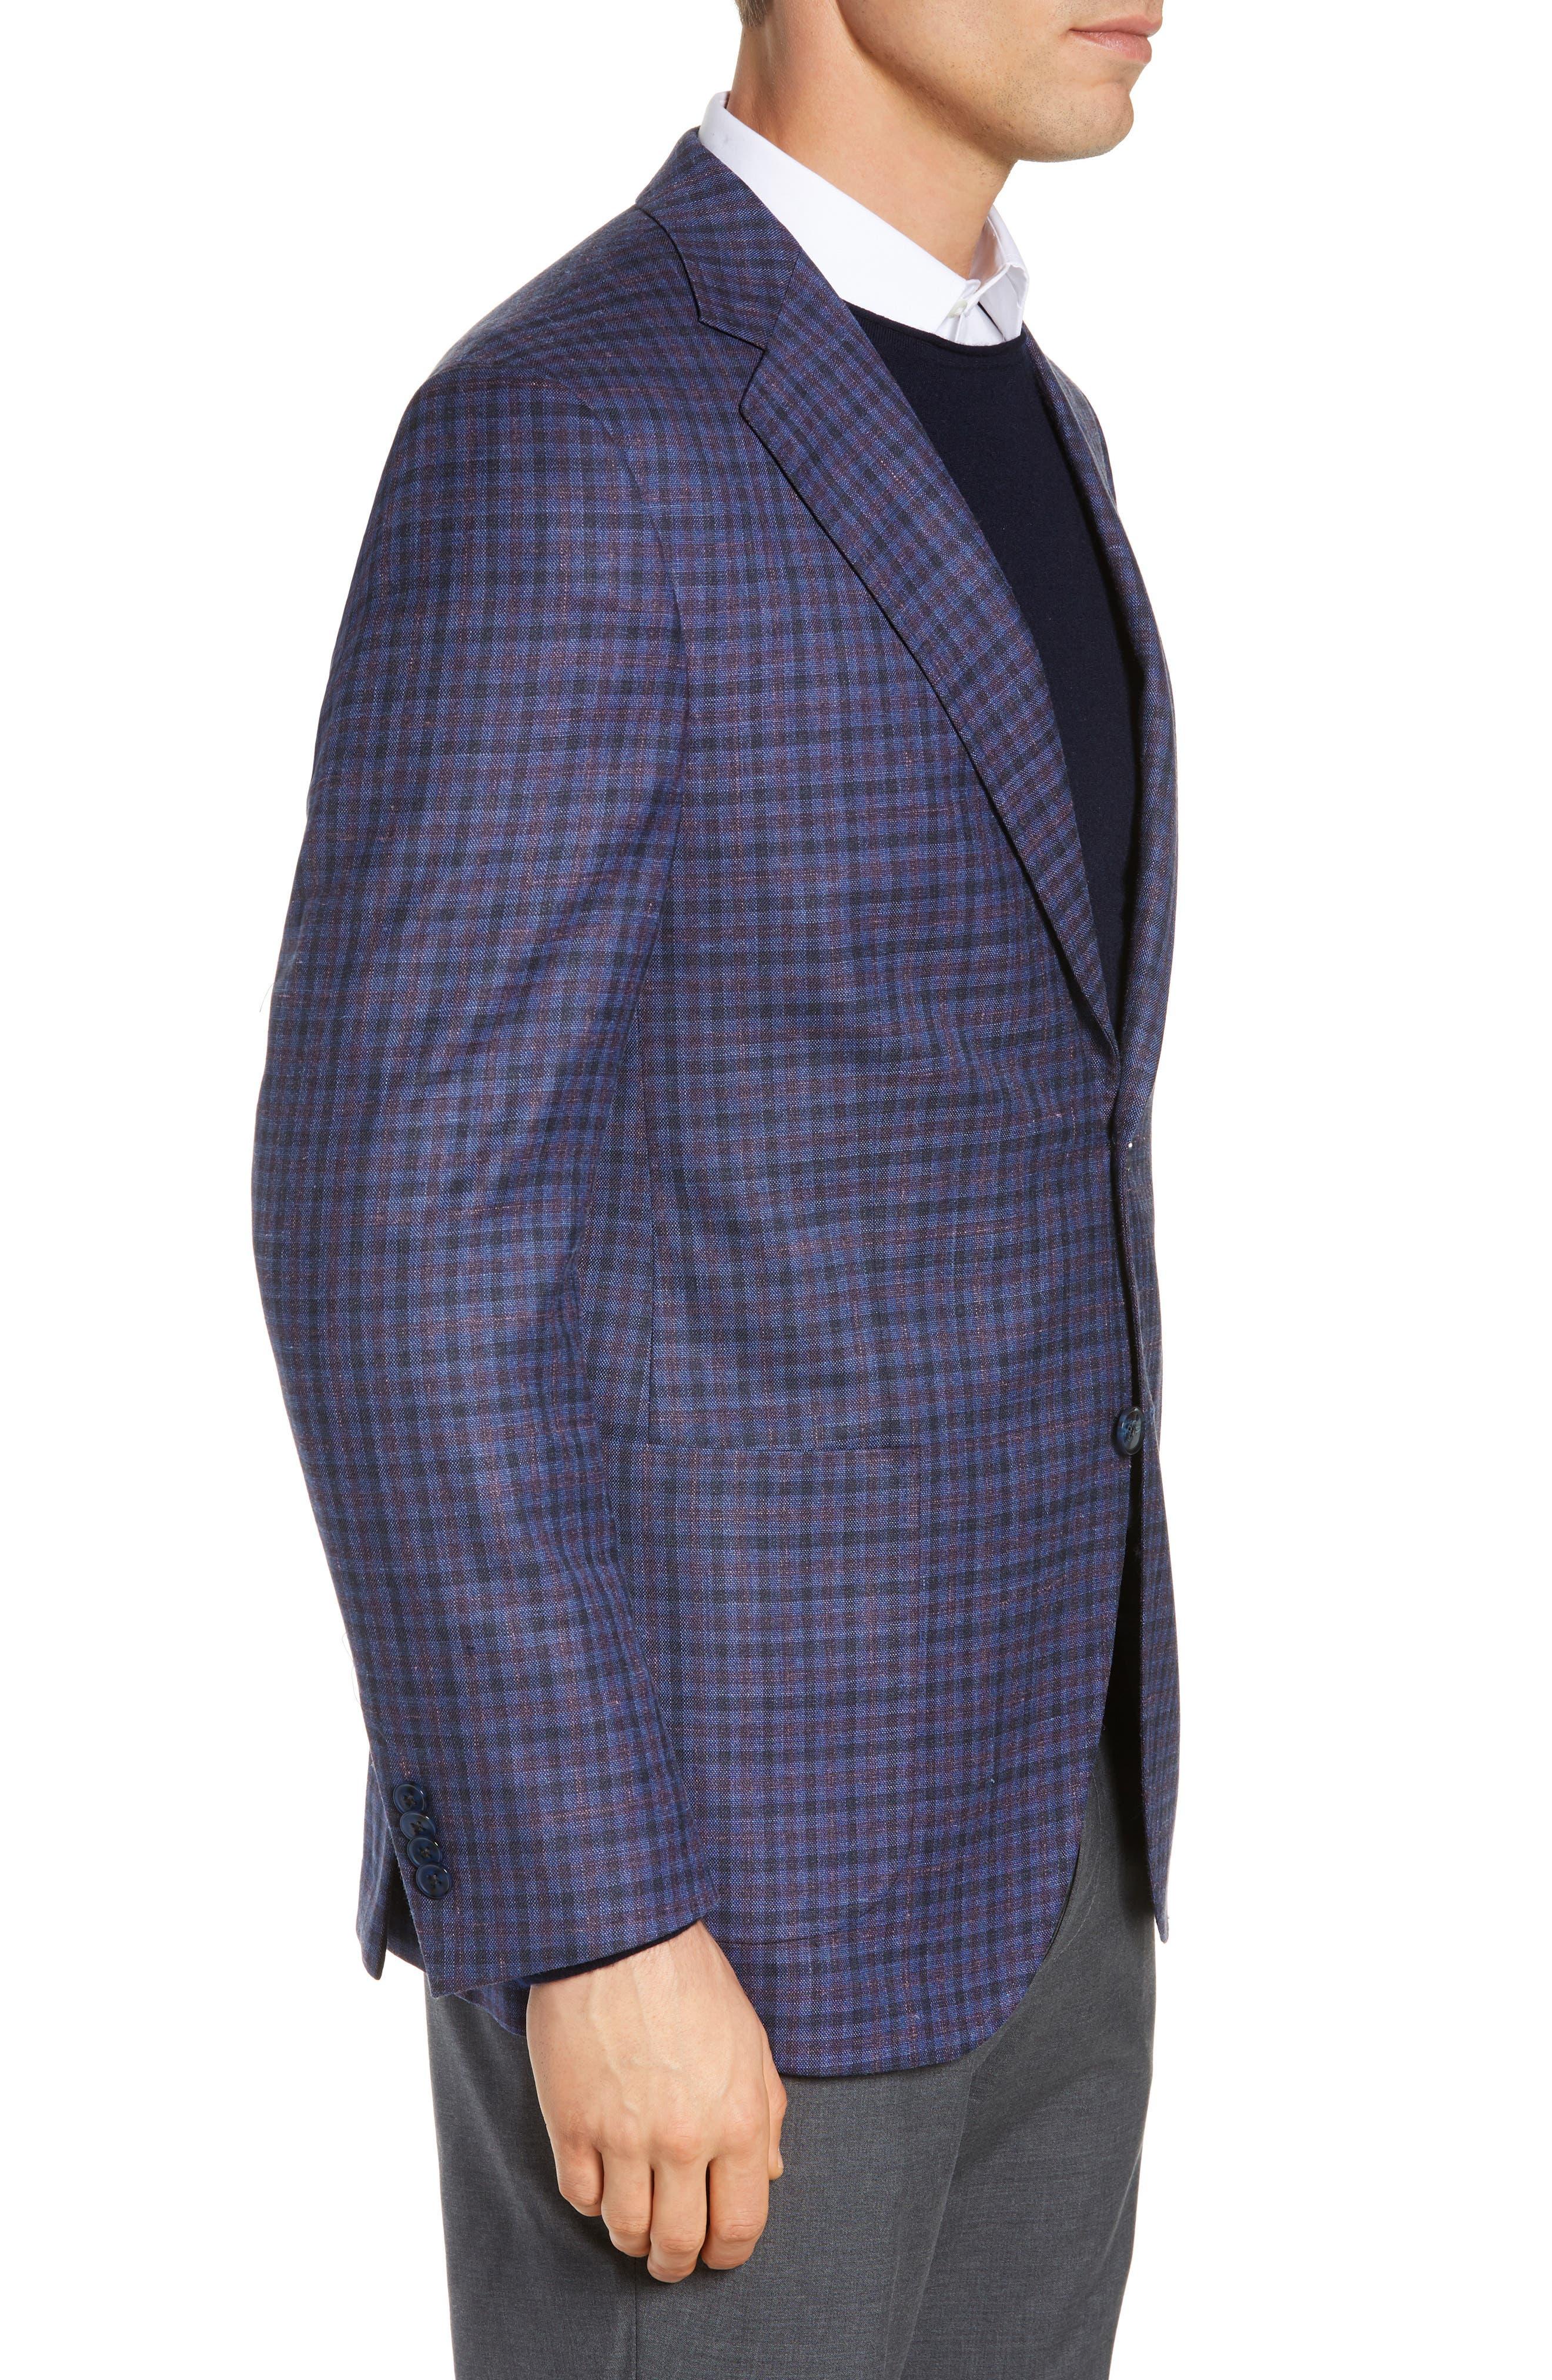 PETER MILLAR, Hyperlight Classic Fit Check Wool Blend Sport Coat, Alternate thumbnail 3, color, BLUE